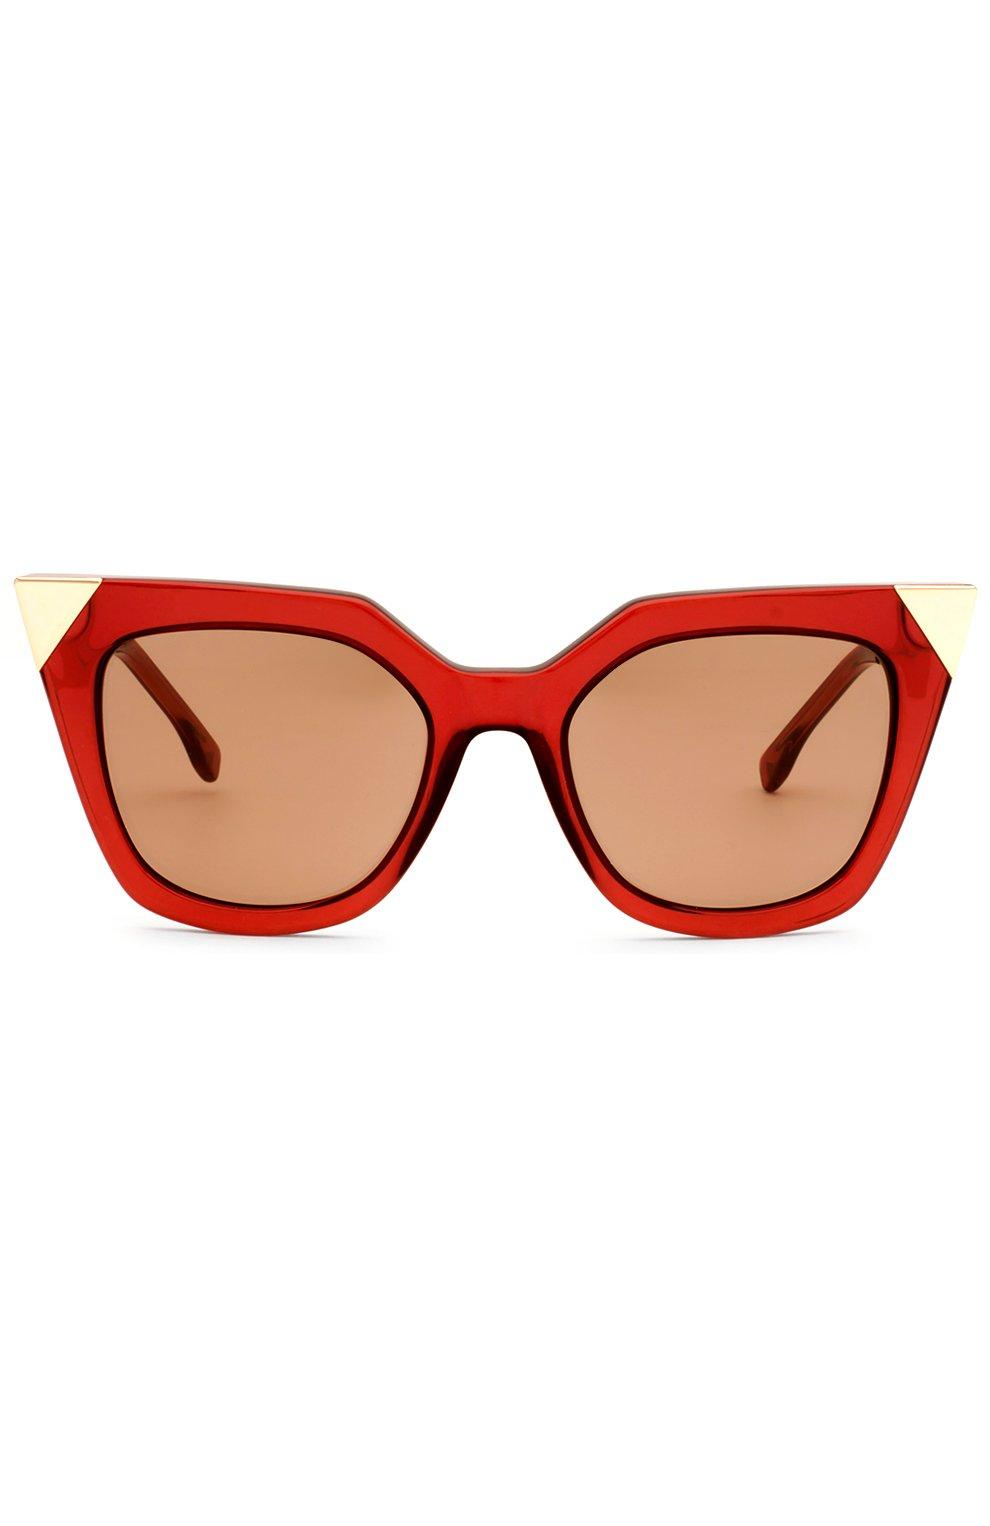 Женские солнцезащитные очки FENDI красного цвета, арт. 0060 N9M | Фото 1